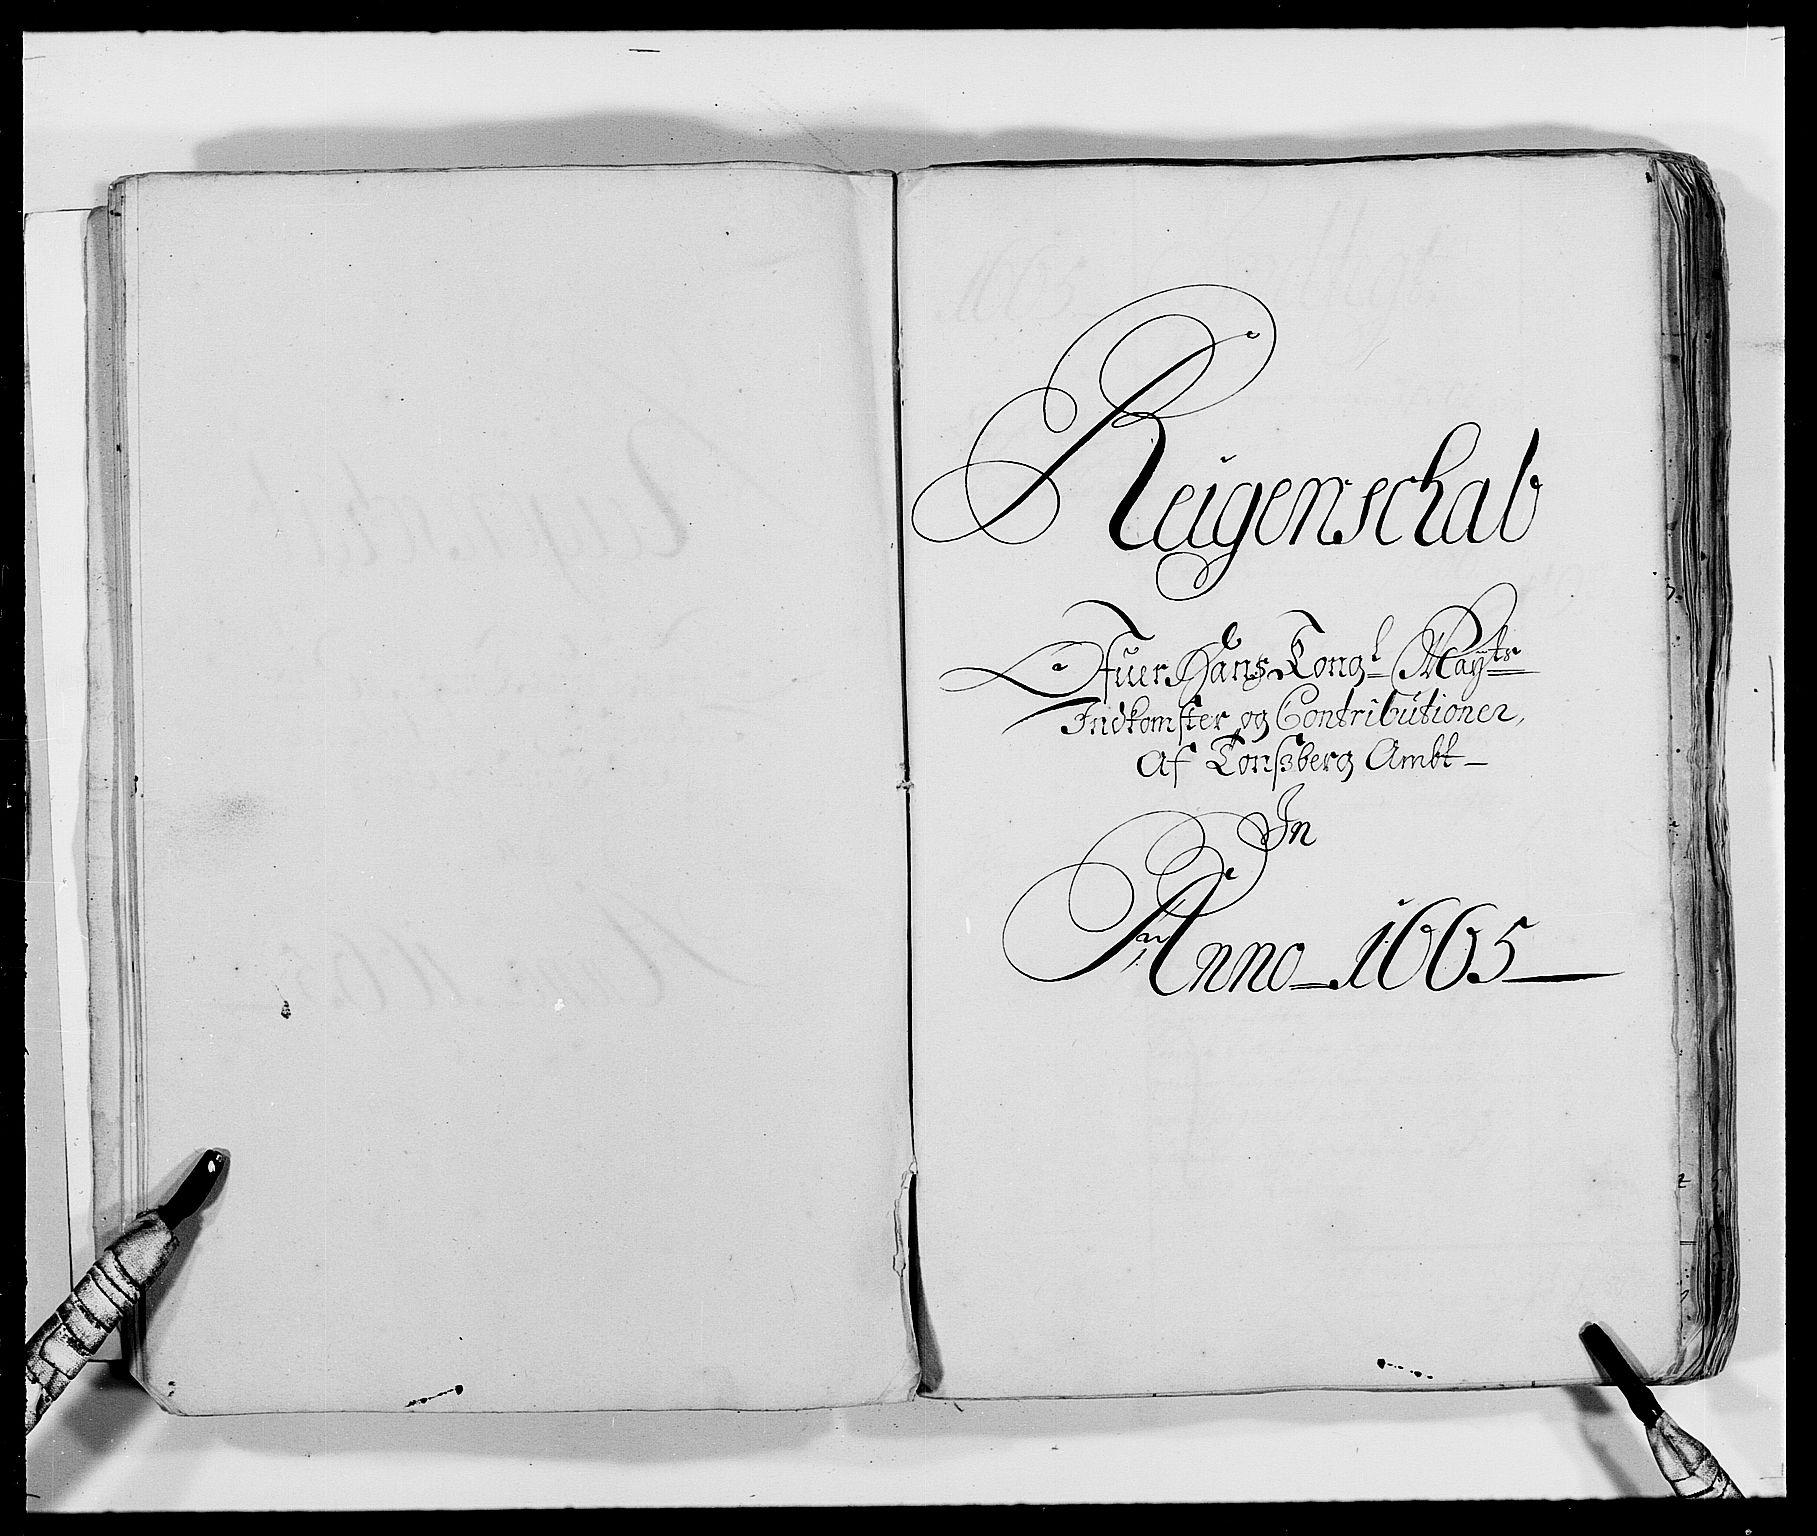 RA, Rentekammeret inntil 1814, Reviderte regnskaper, Fogderegnskap, R32/L1839: Fogderegnskap Jarlsberg grevskap, 1664-1673, s. 20